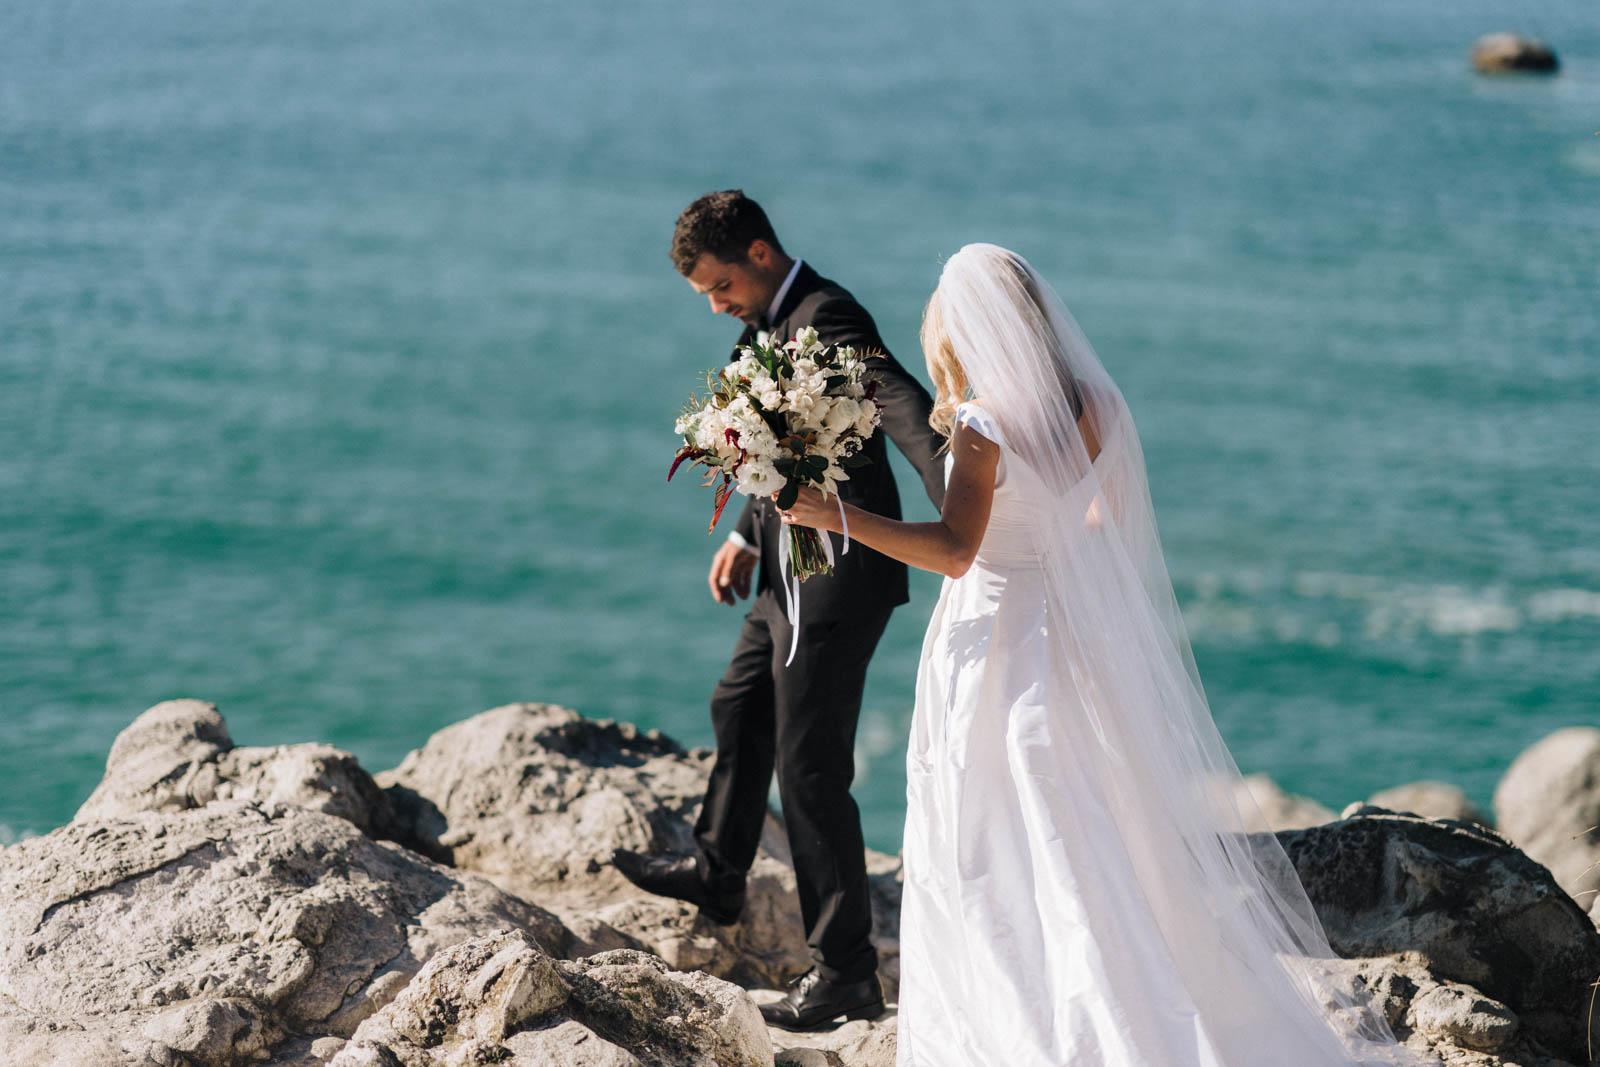 newfound-s-p-mt-maunganui-tauranga-wedding-photographer-1526-A9_05336